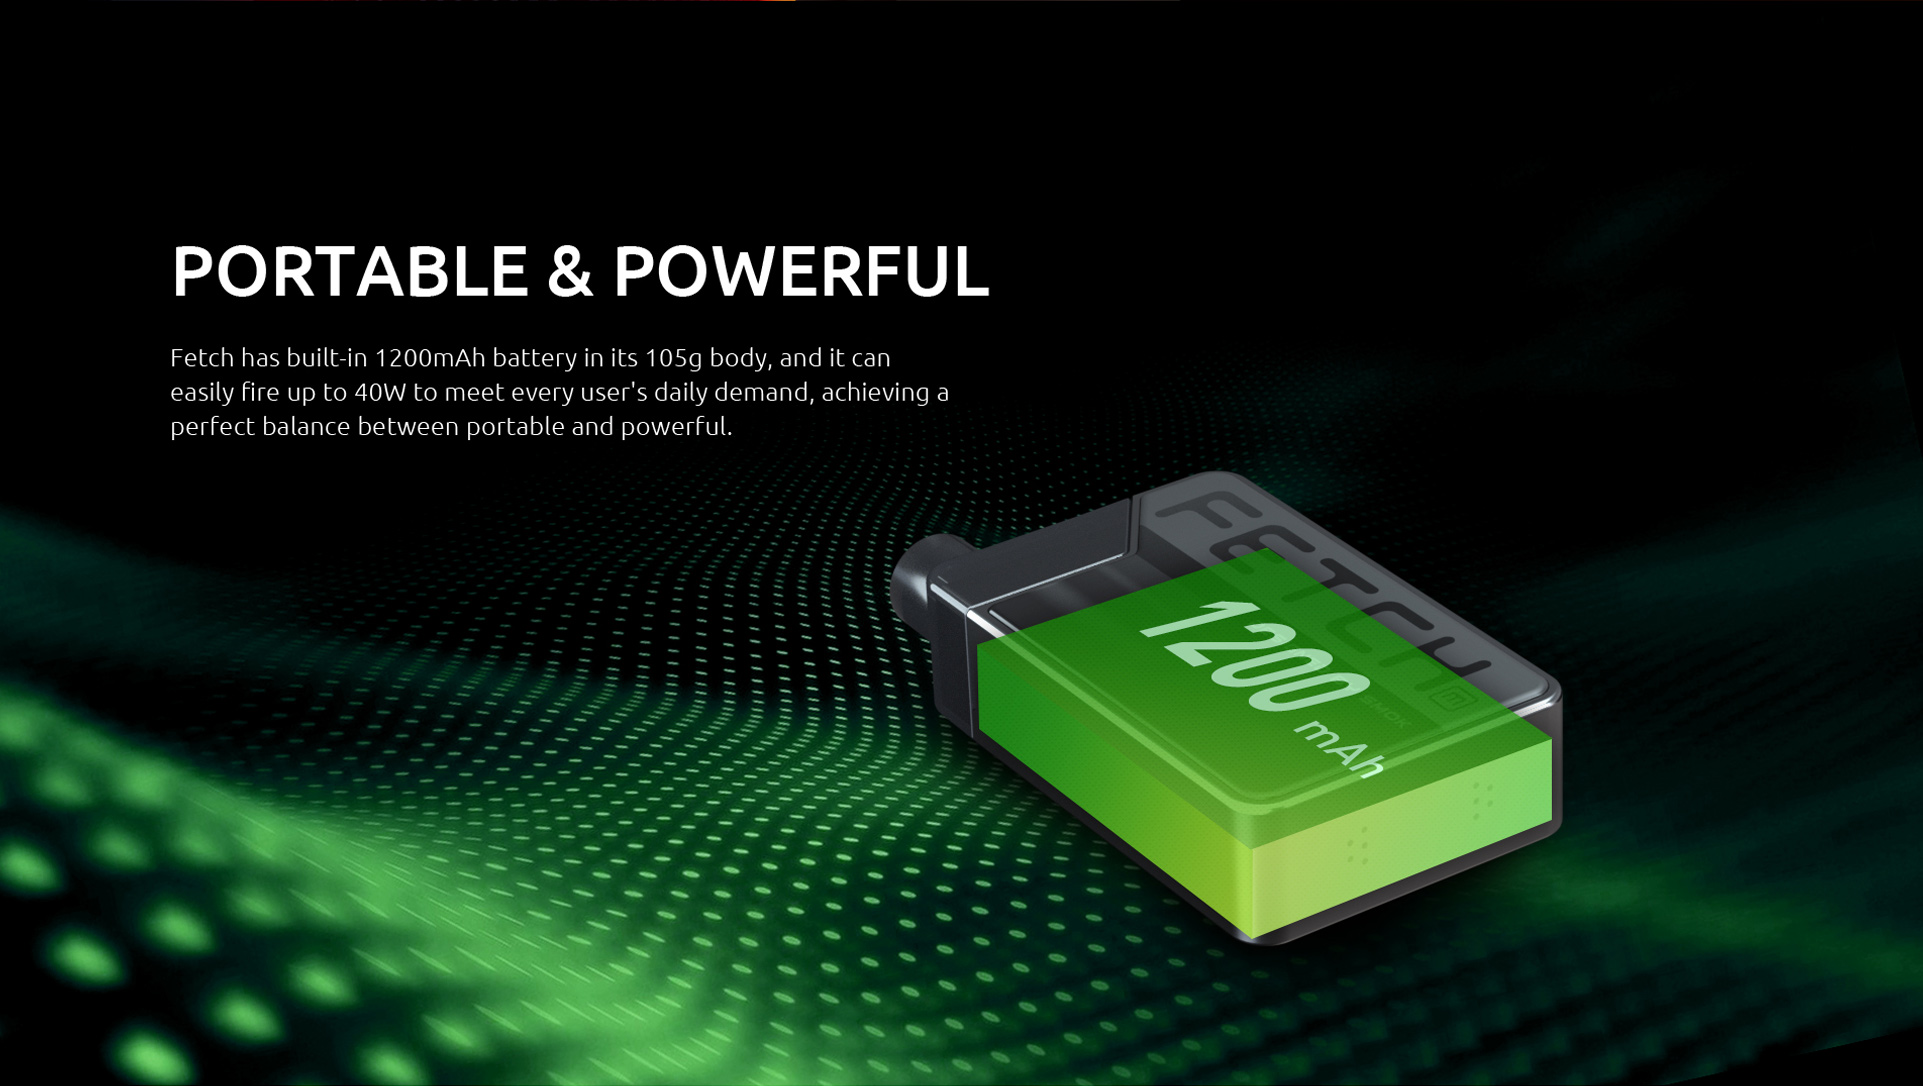 SMOK Fetch Mini Has a 1200mAh Built-In Battery